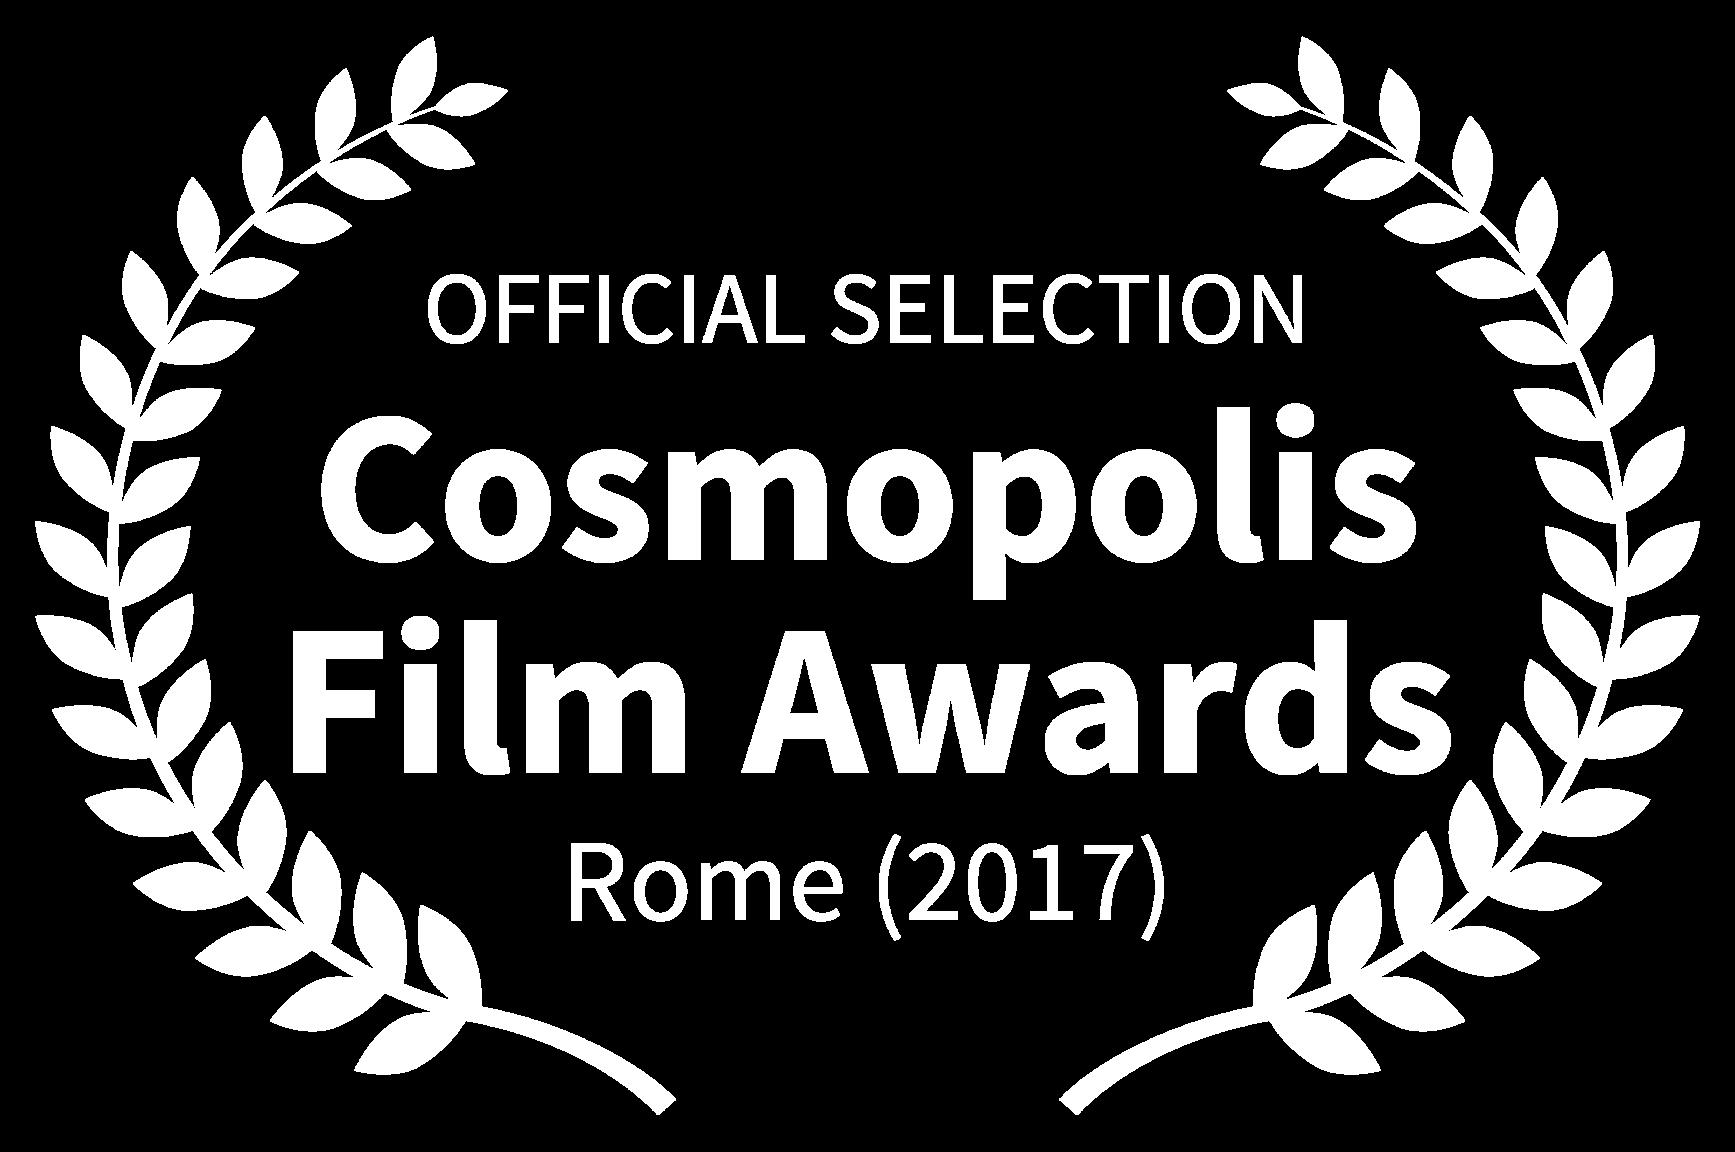 OFFICIAL SELECTION - Cosmopolis Film Awards - Rome 2017